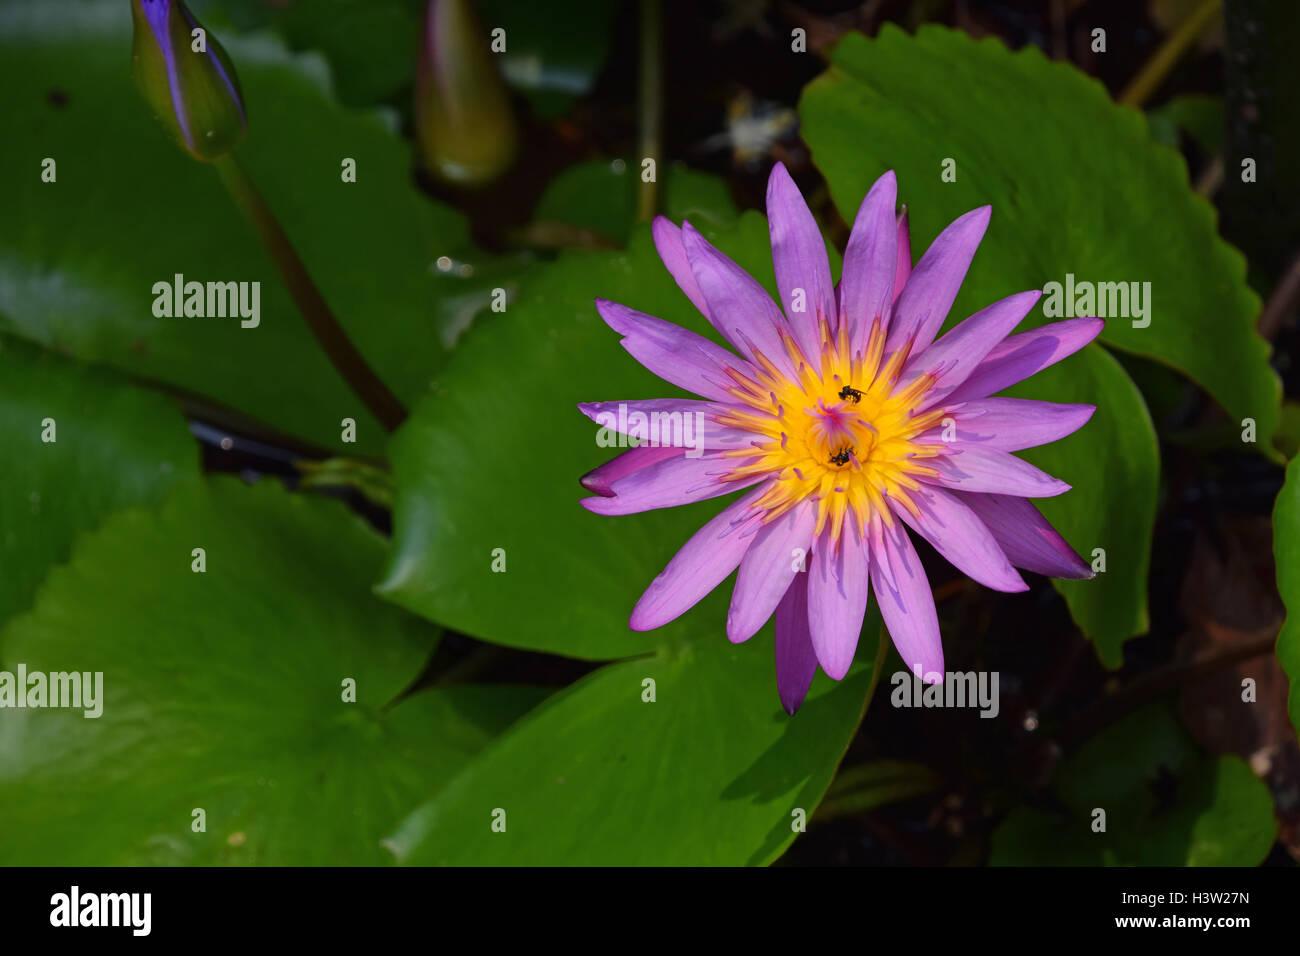 One Purple Flower Of Nymphaea Caerulea Aka Blue Lotus Flower Or